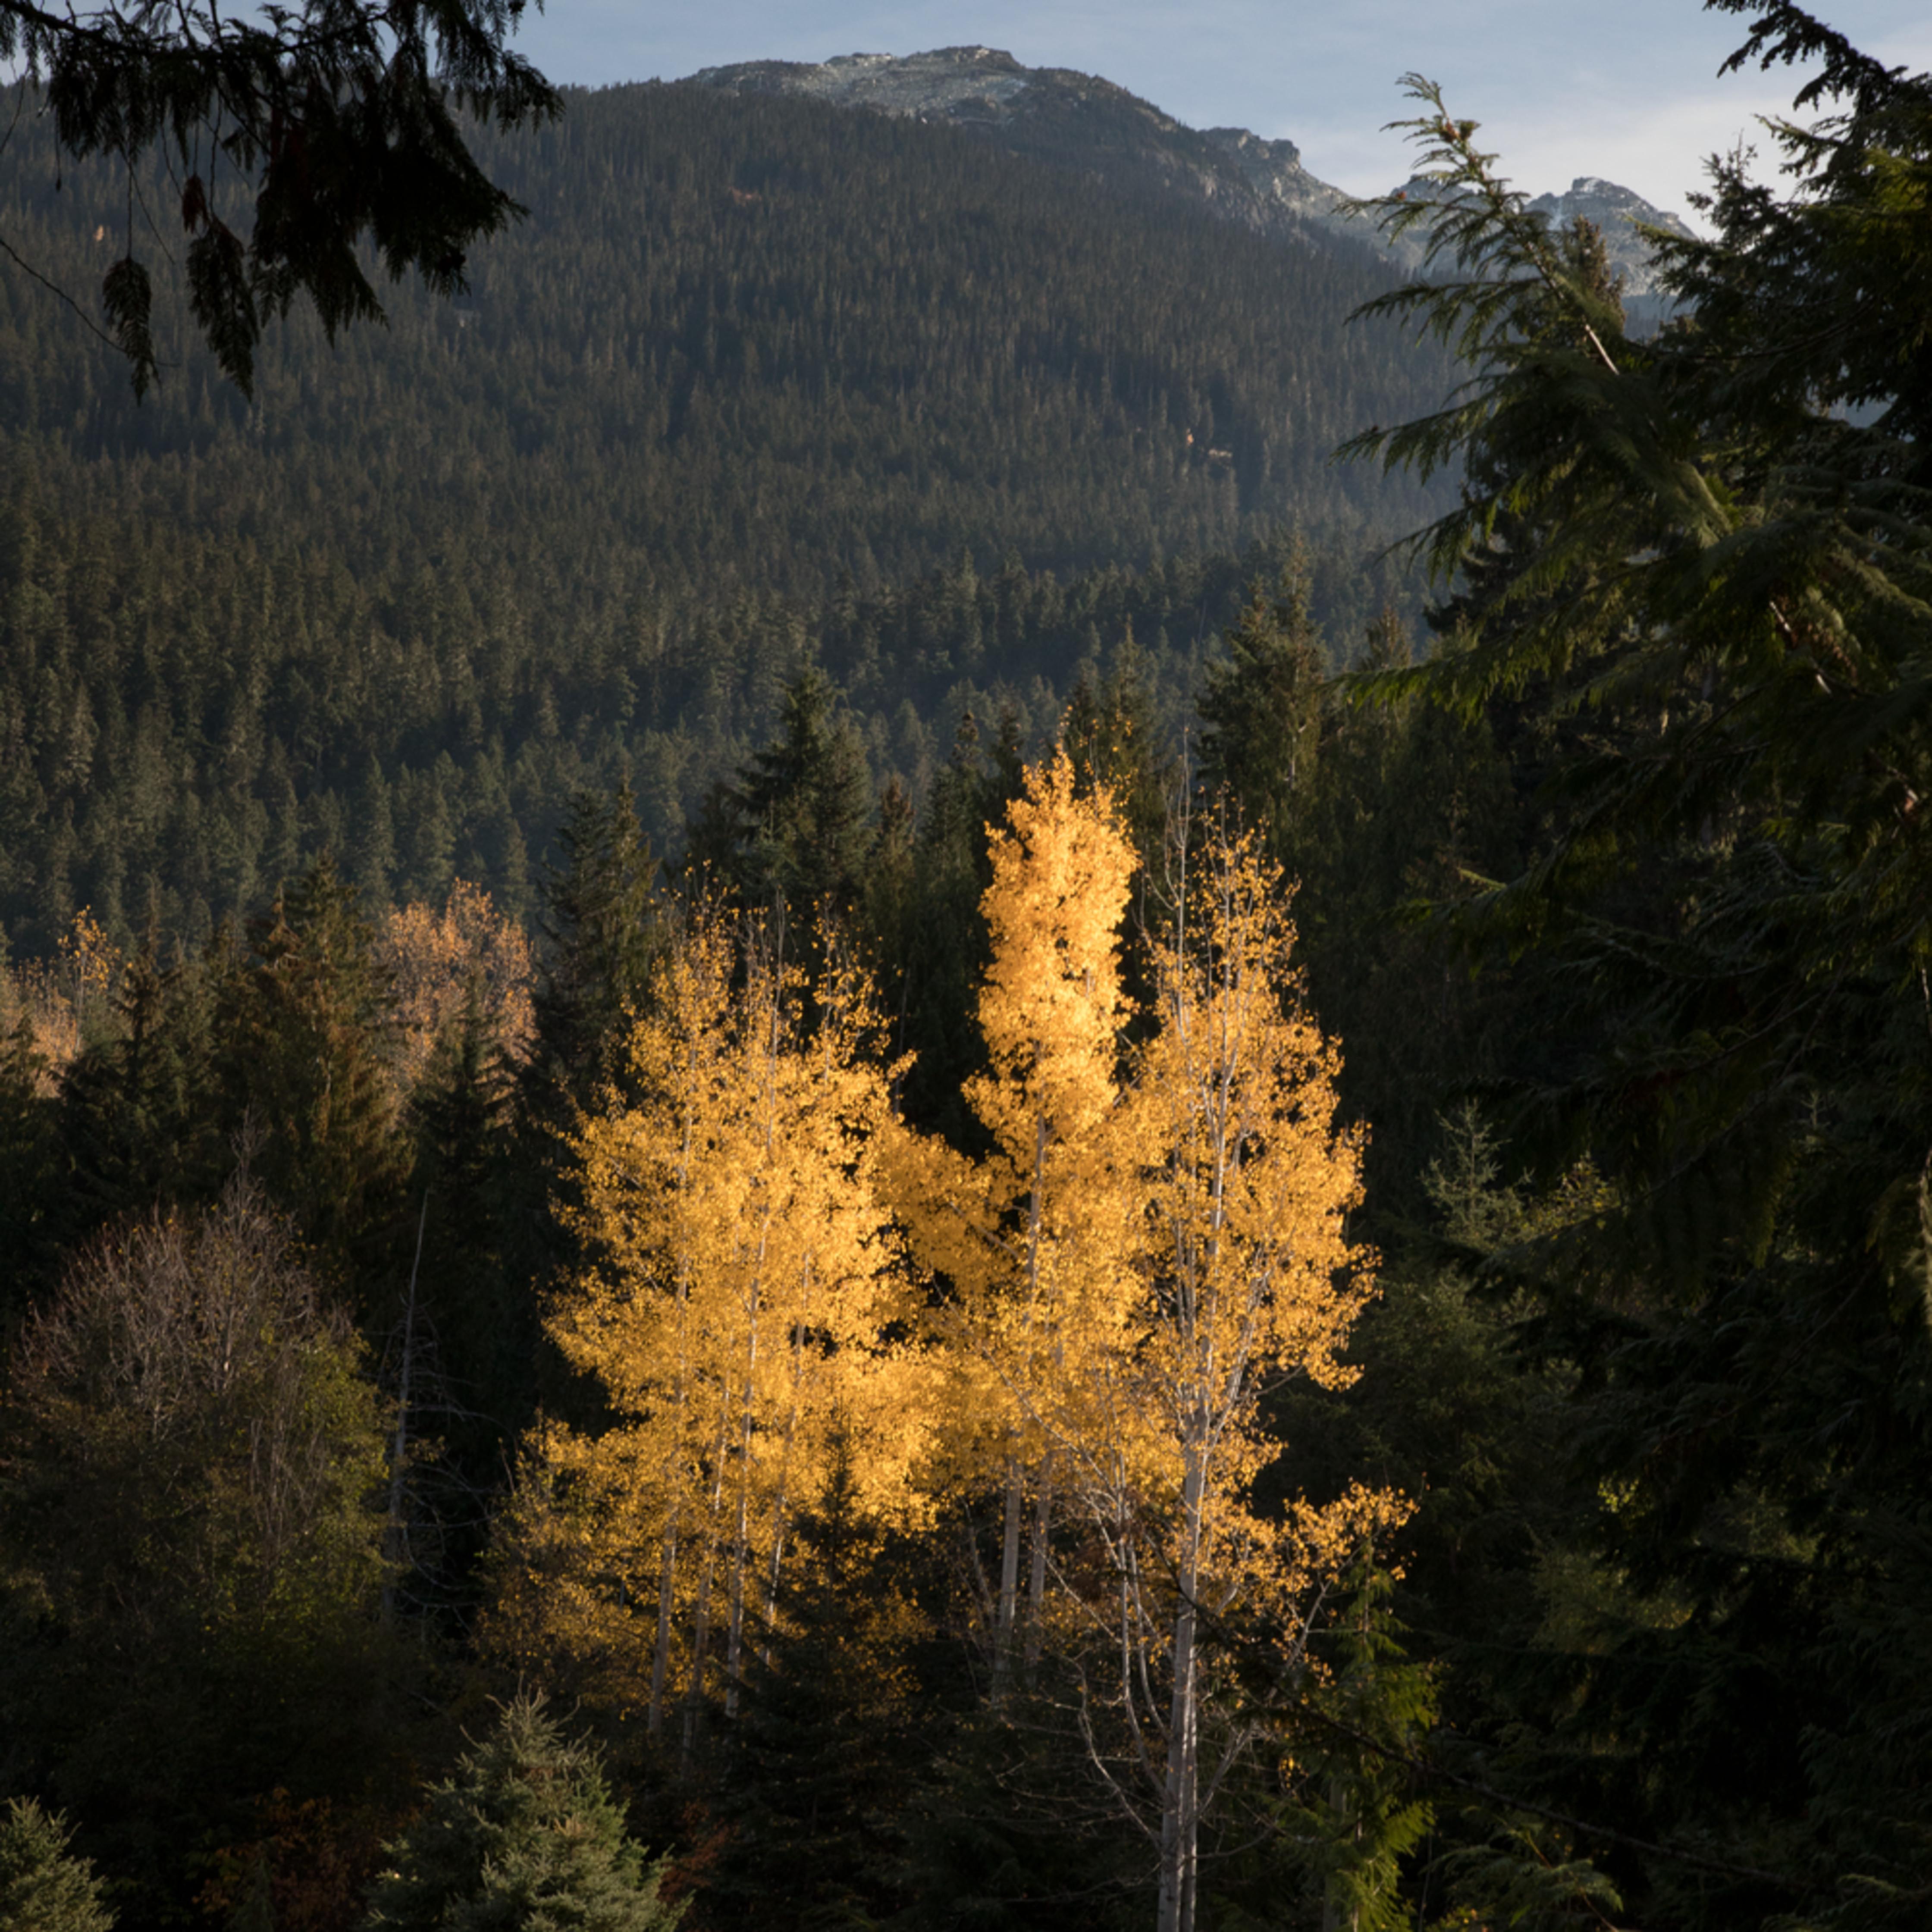 Whistler trees ecq2jx